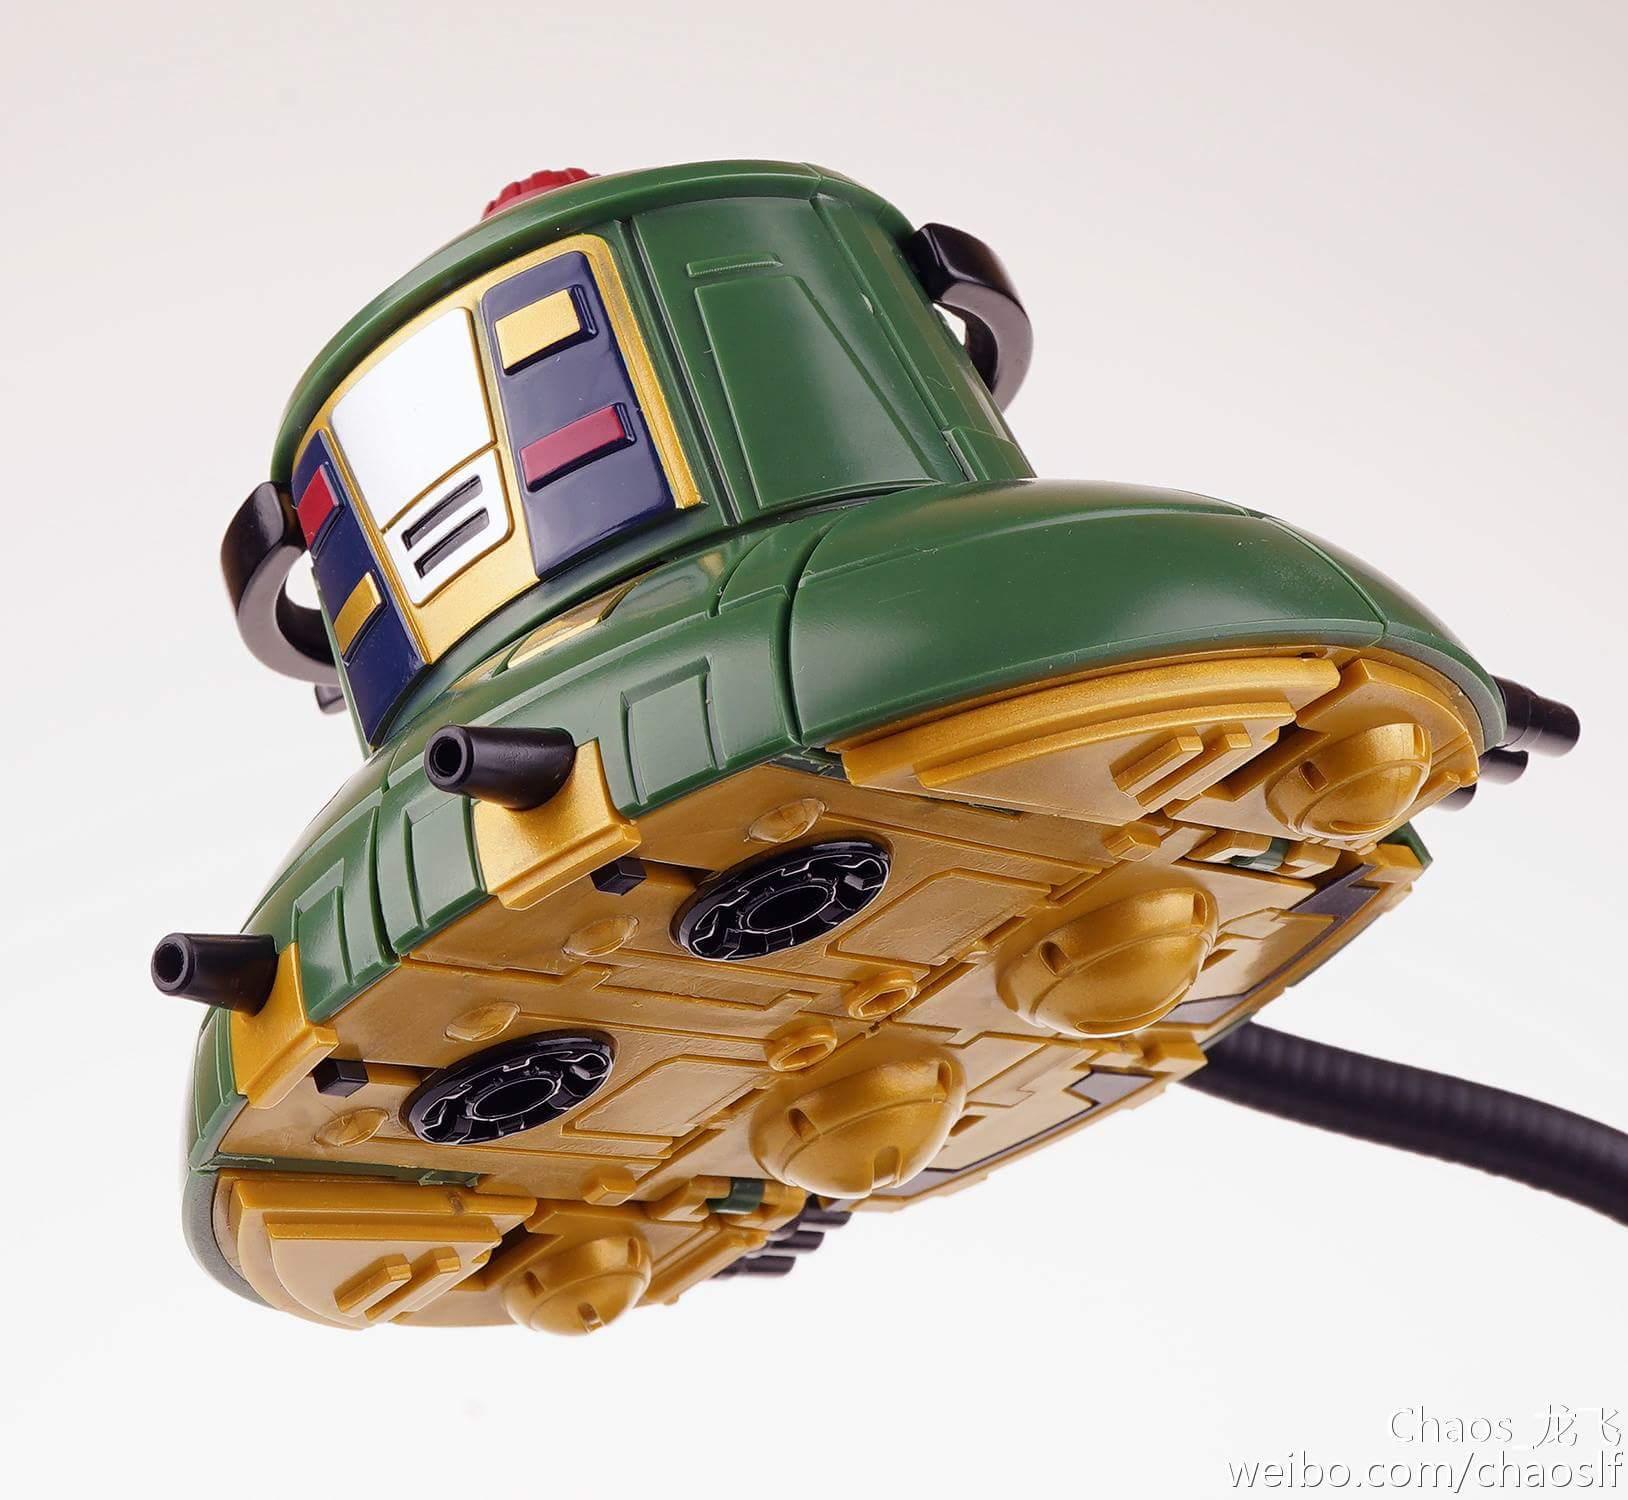 [Toyworld][Zeta Toys] Produit Tiers - Minibots MP - Gamme EX - Page 2 B162Wyjs